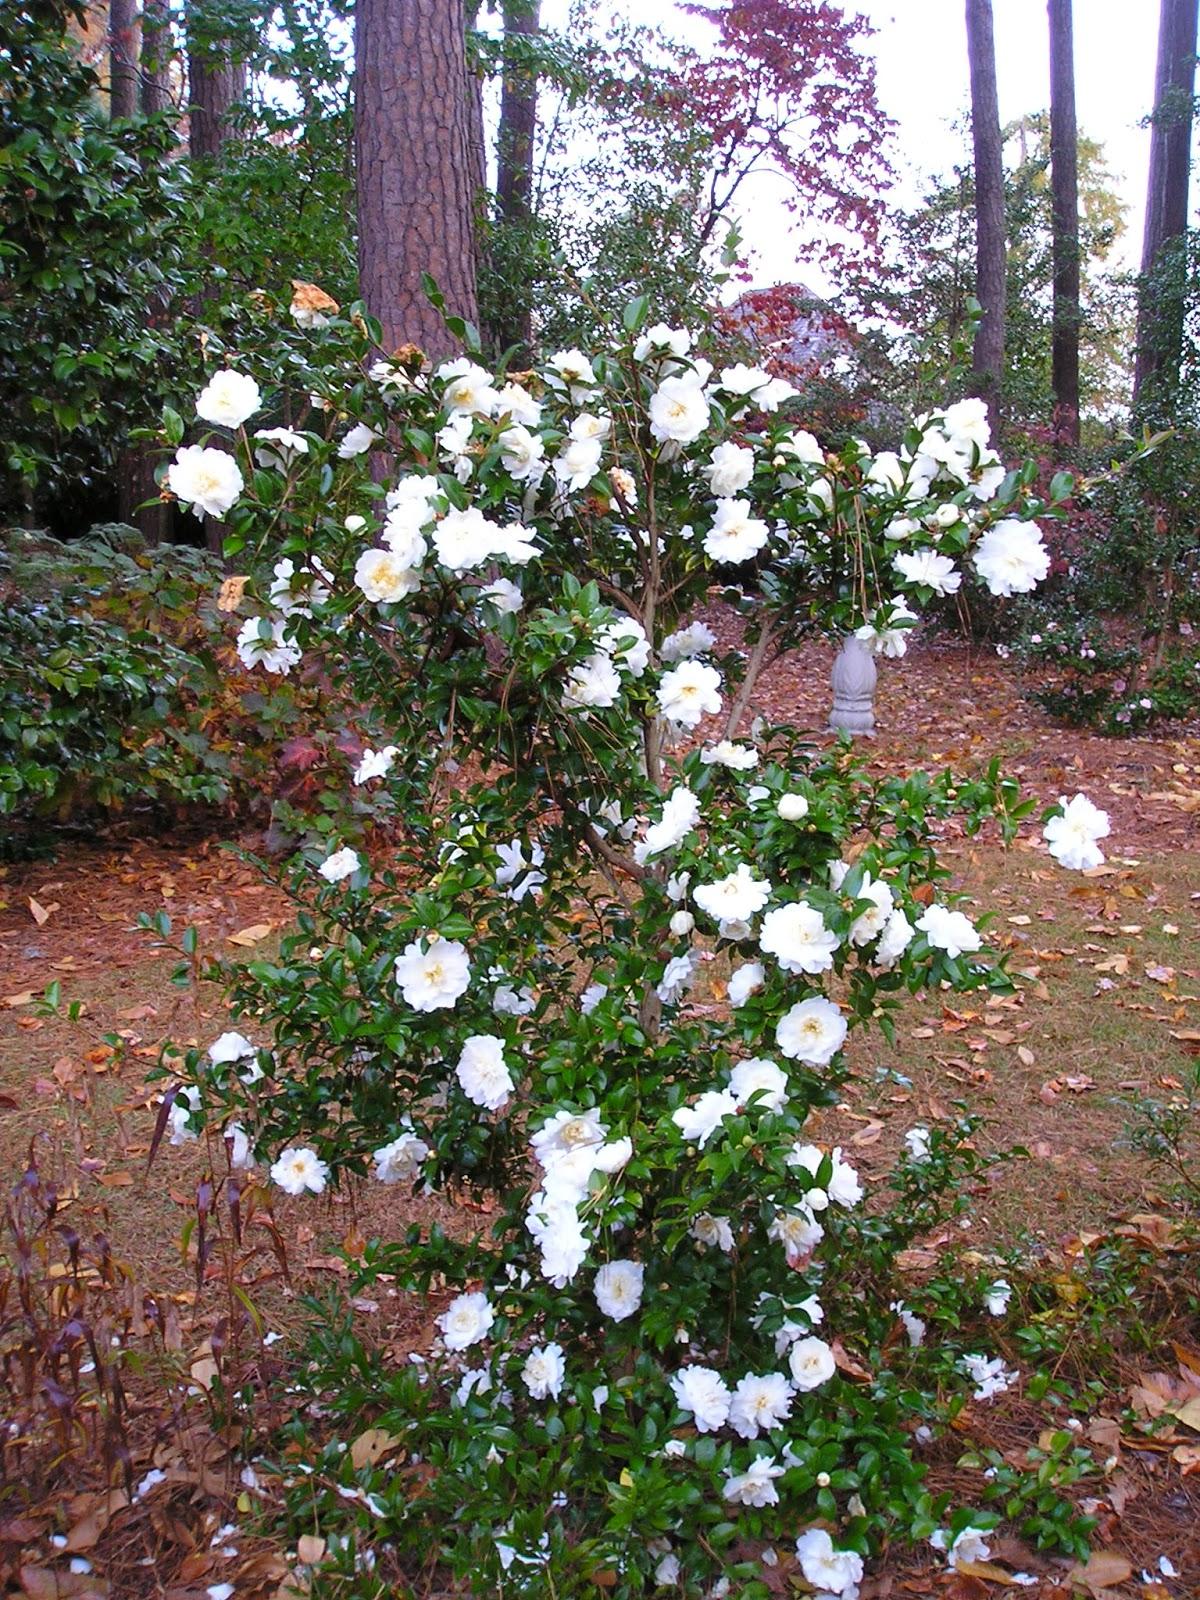 Carol S Garden: Carol's Greenville NC Garden: Mine-no-yuki